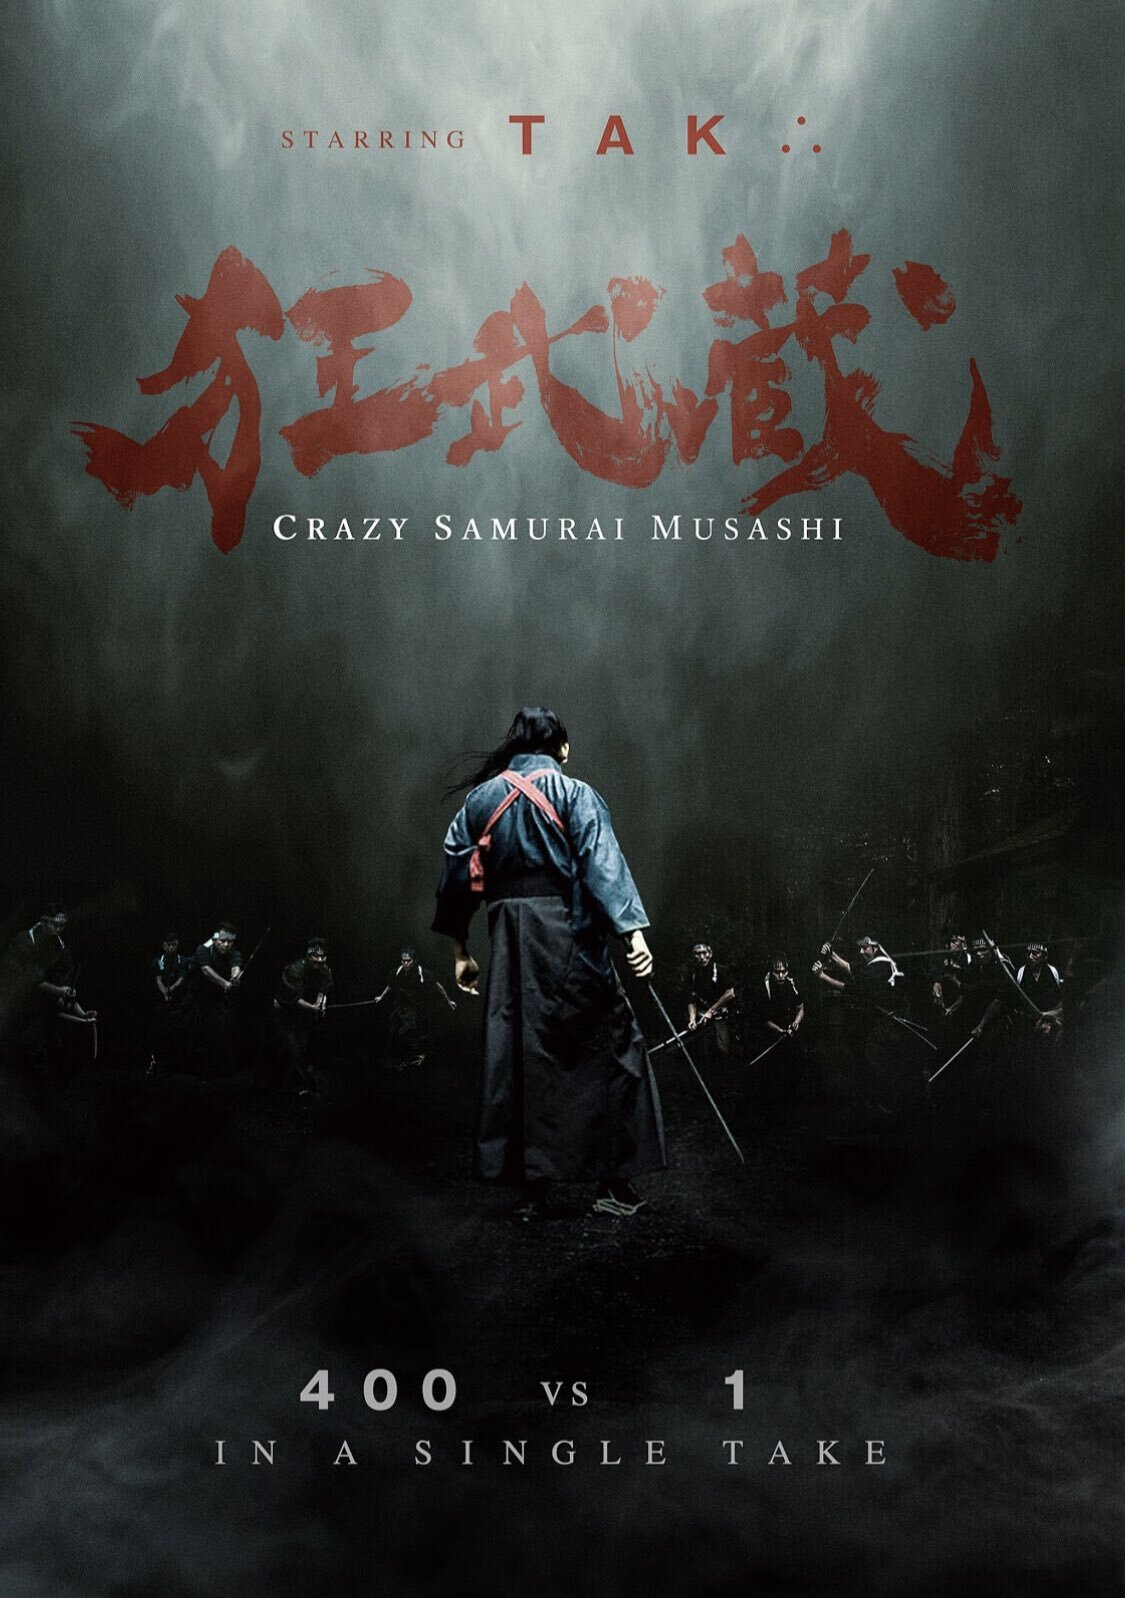 Crazy Samurai Musashi (2020) Full Movie [In Japanese] With Hindi Subtitles | BluRay 720p [1XBET]